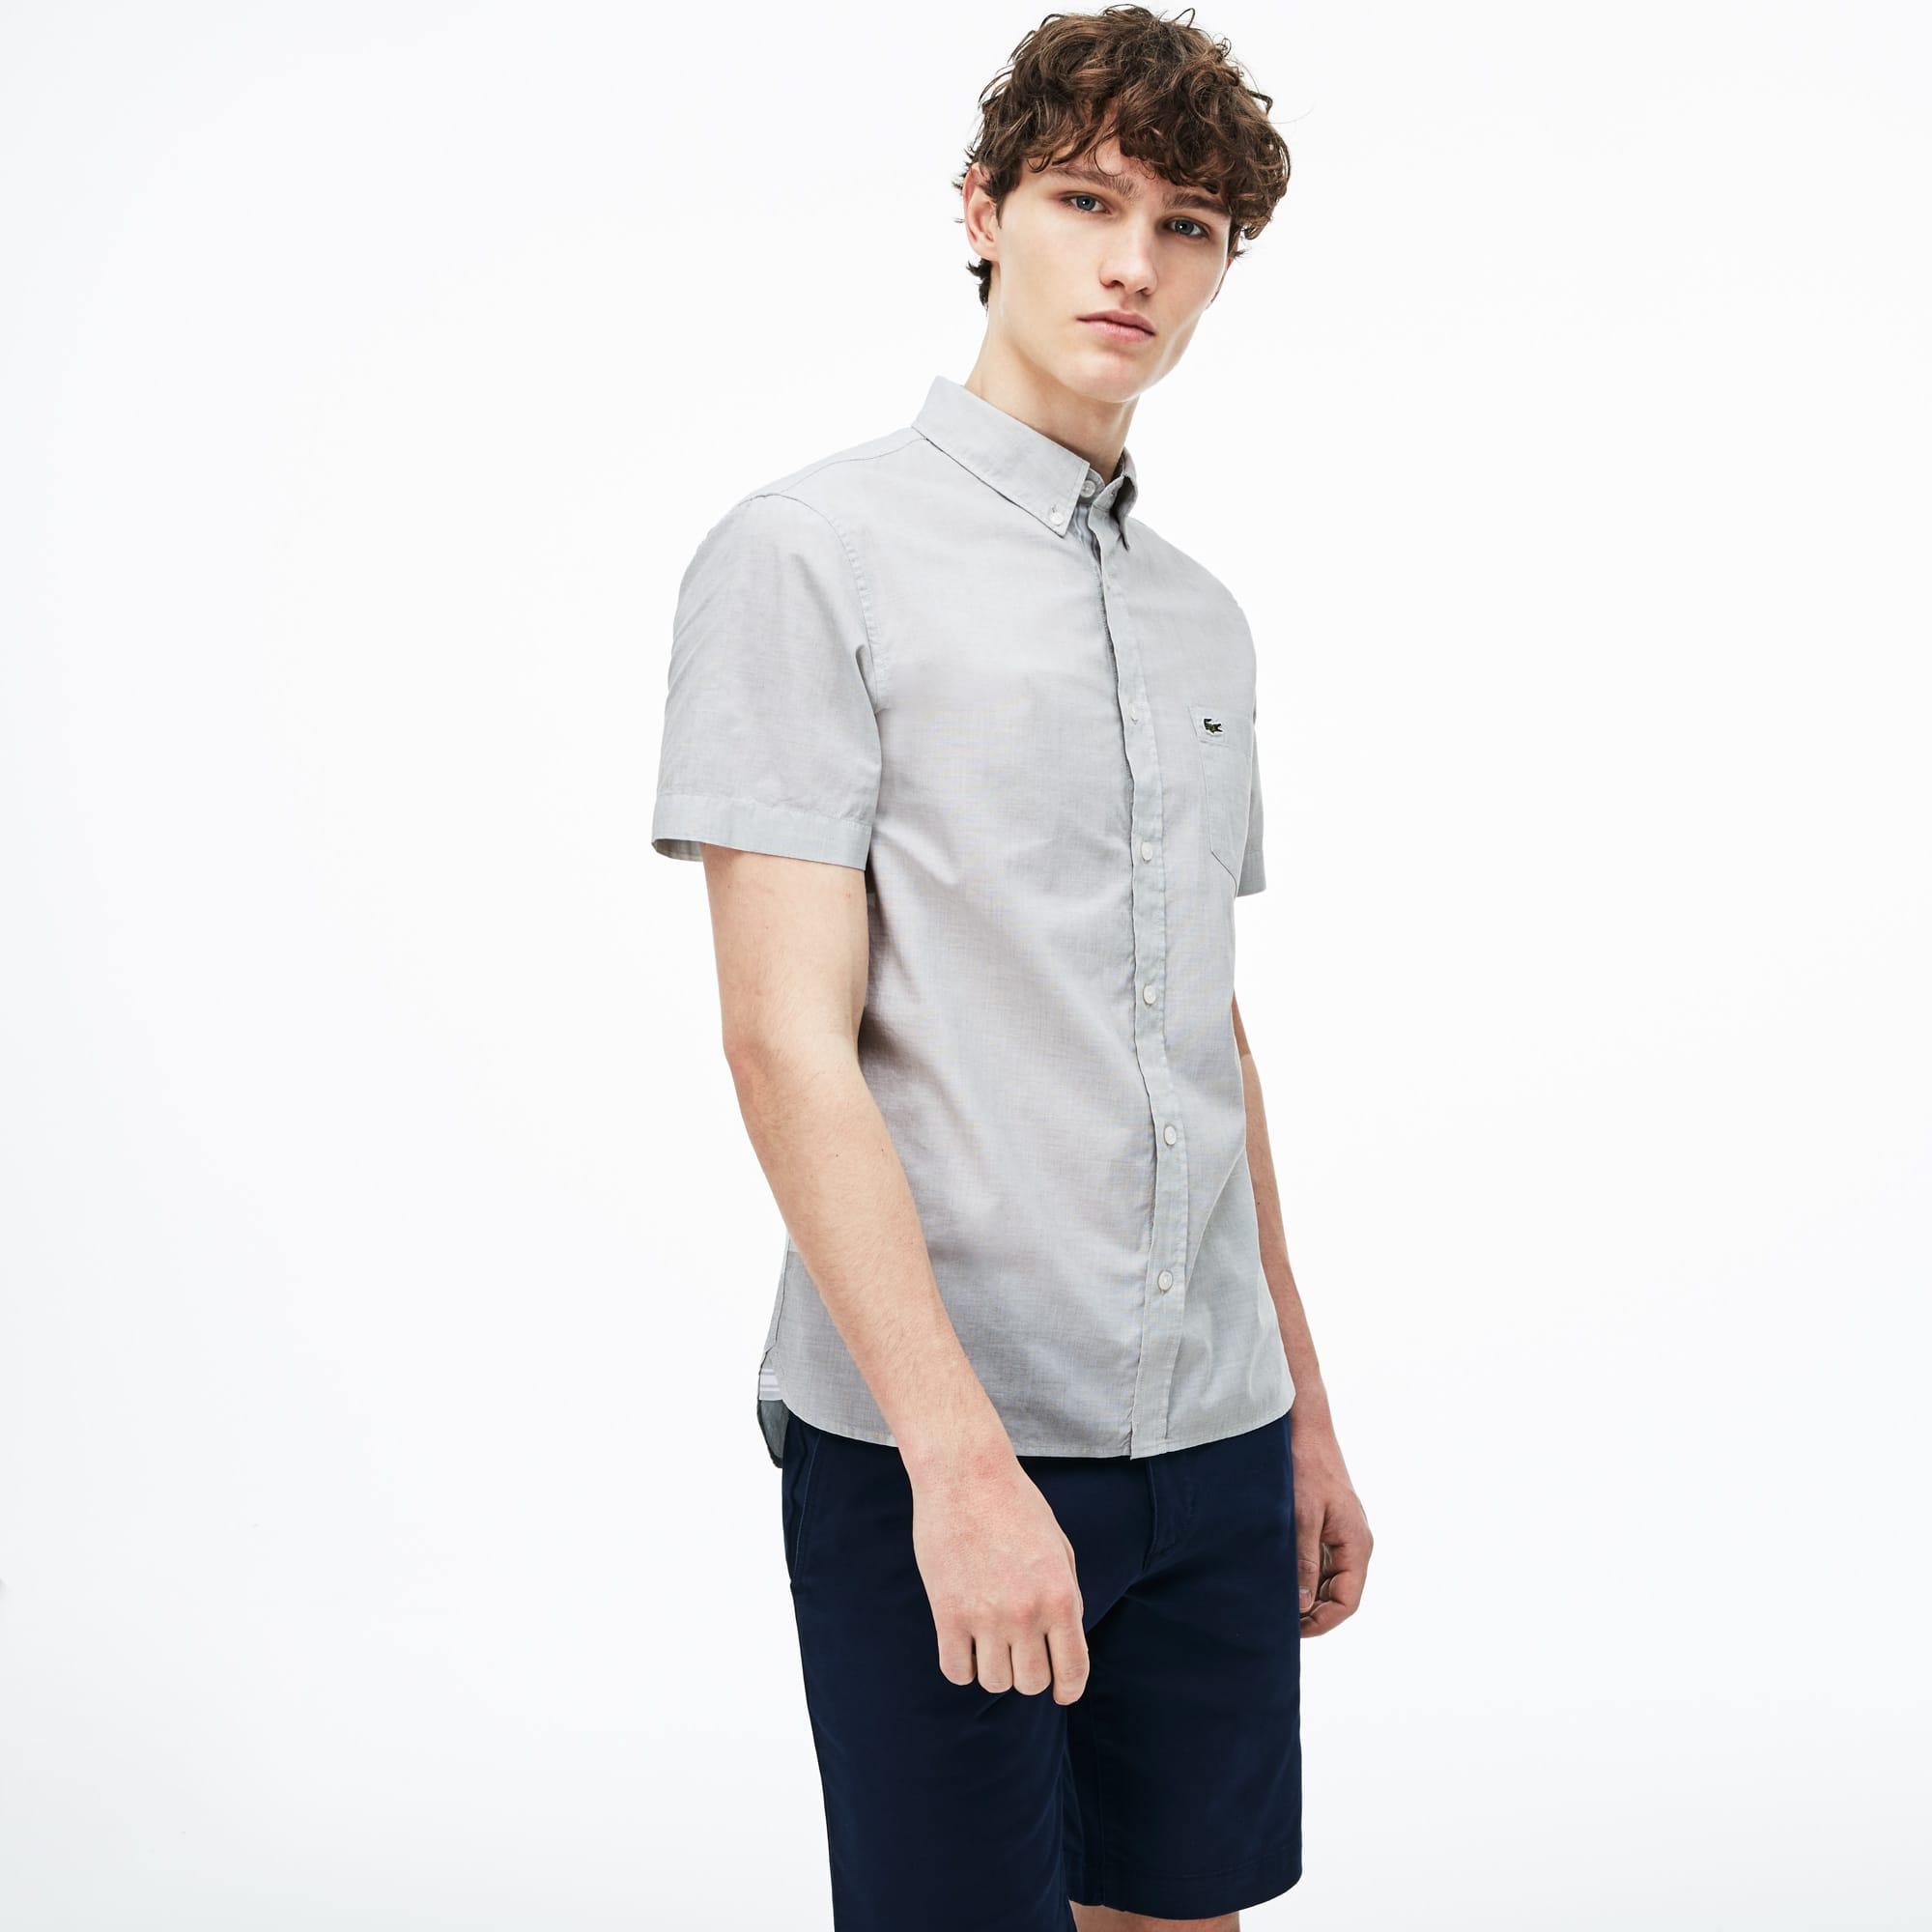 45fb2d0220 Camisa Slim Fit Masculina de Algodão com Mescla de Tons Claros e Escuros ...